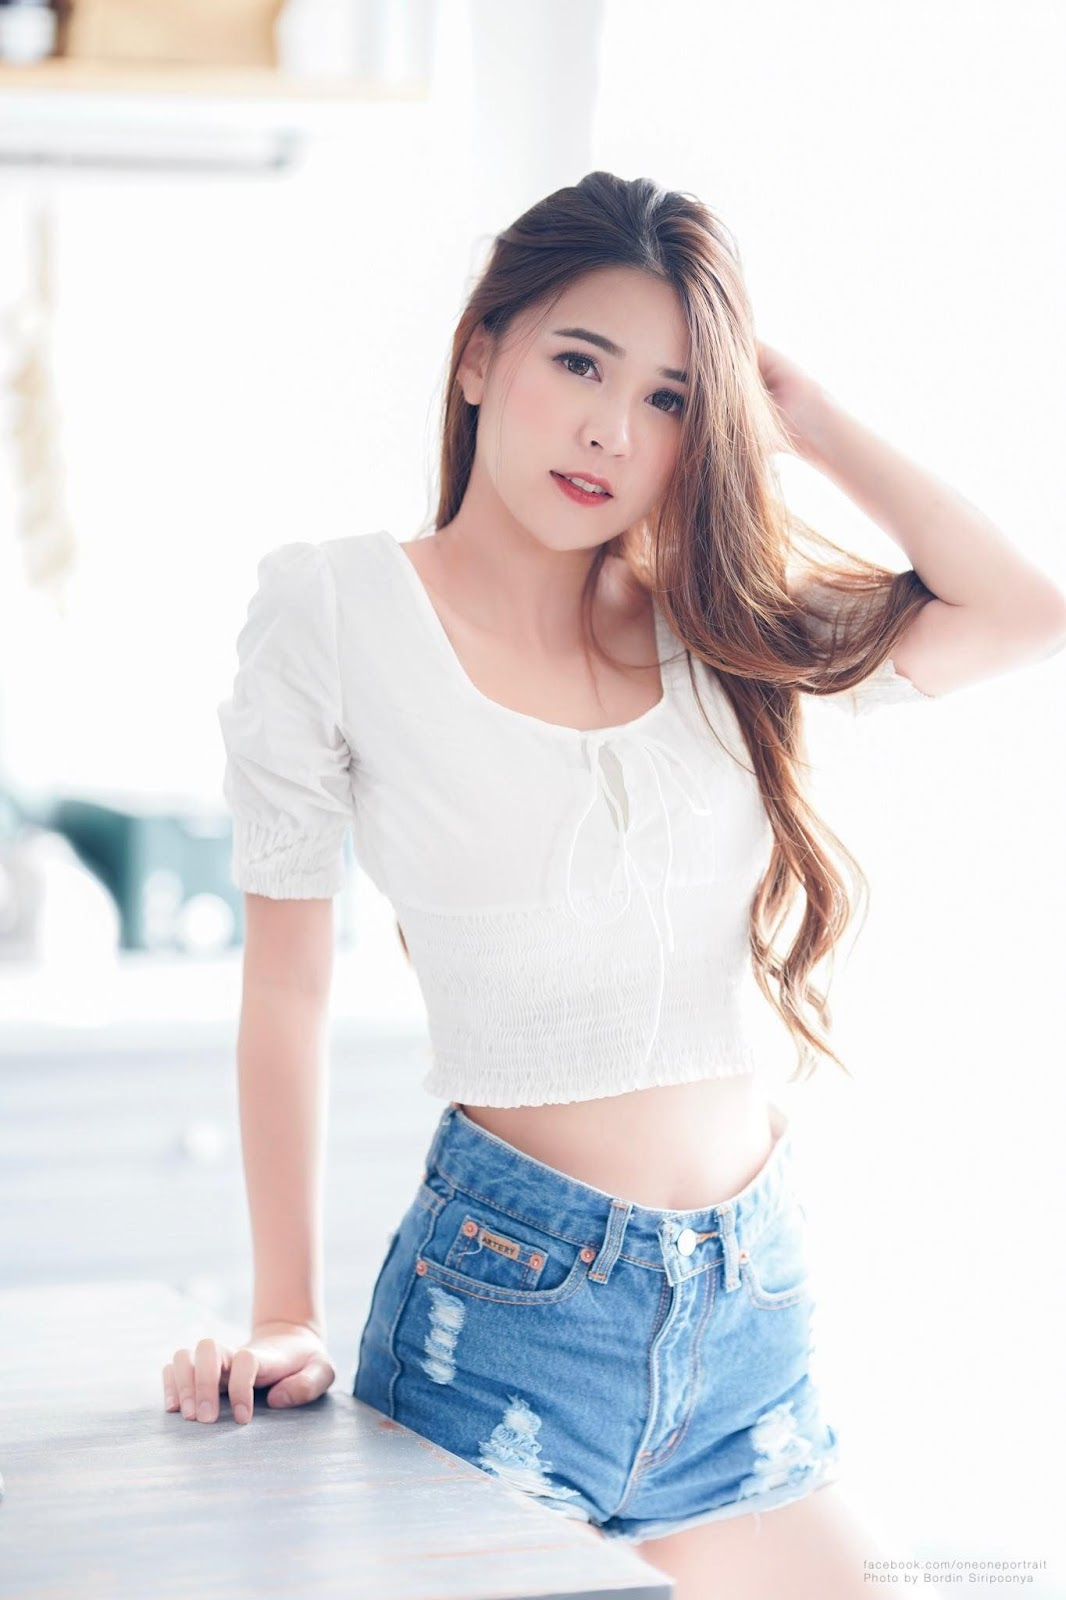 Thailand cute model Supansa Yoopradit (Lorpor) - Lovely smile girl - Picture 5